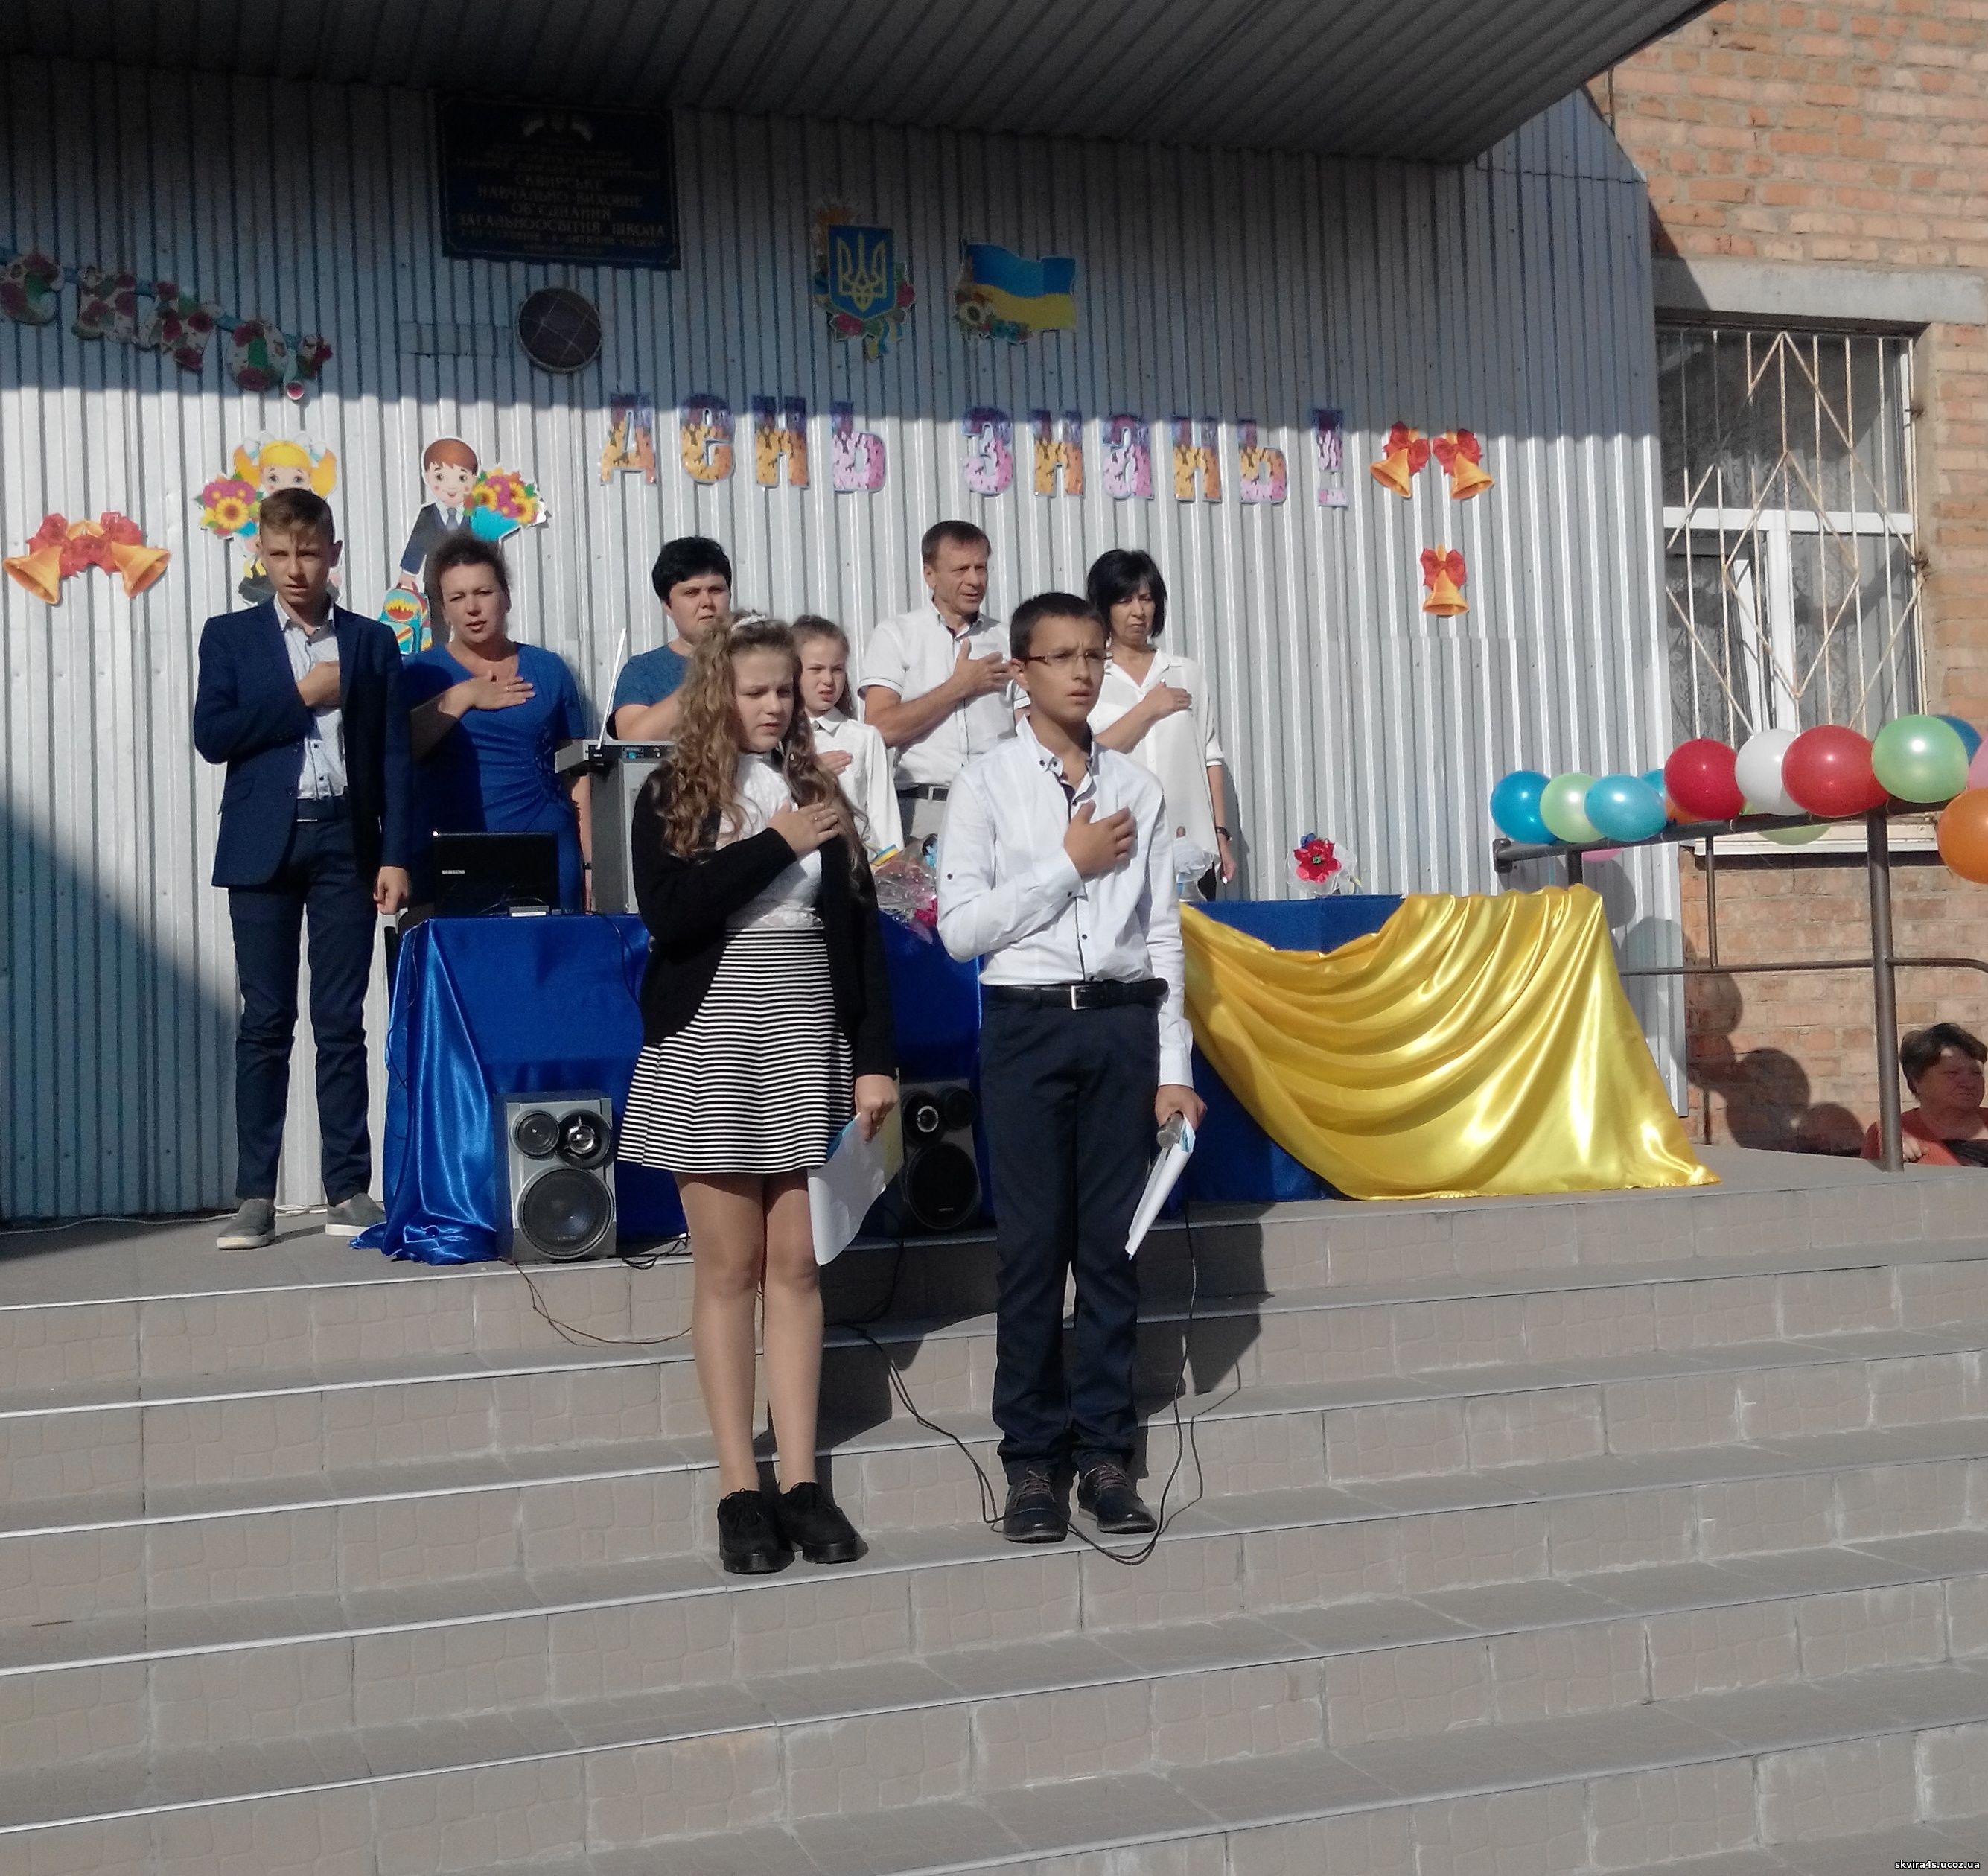 http://skvira4s.ucoz.ua/foto/01-09-2017/2017901090802.jpg